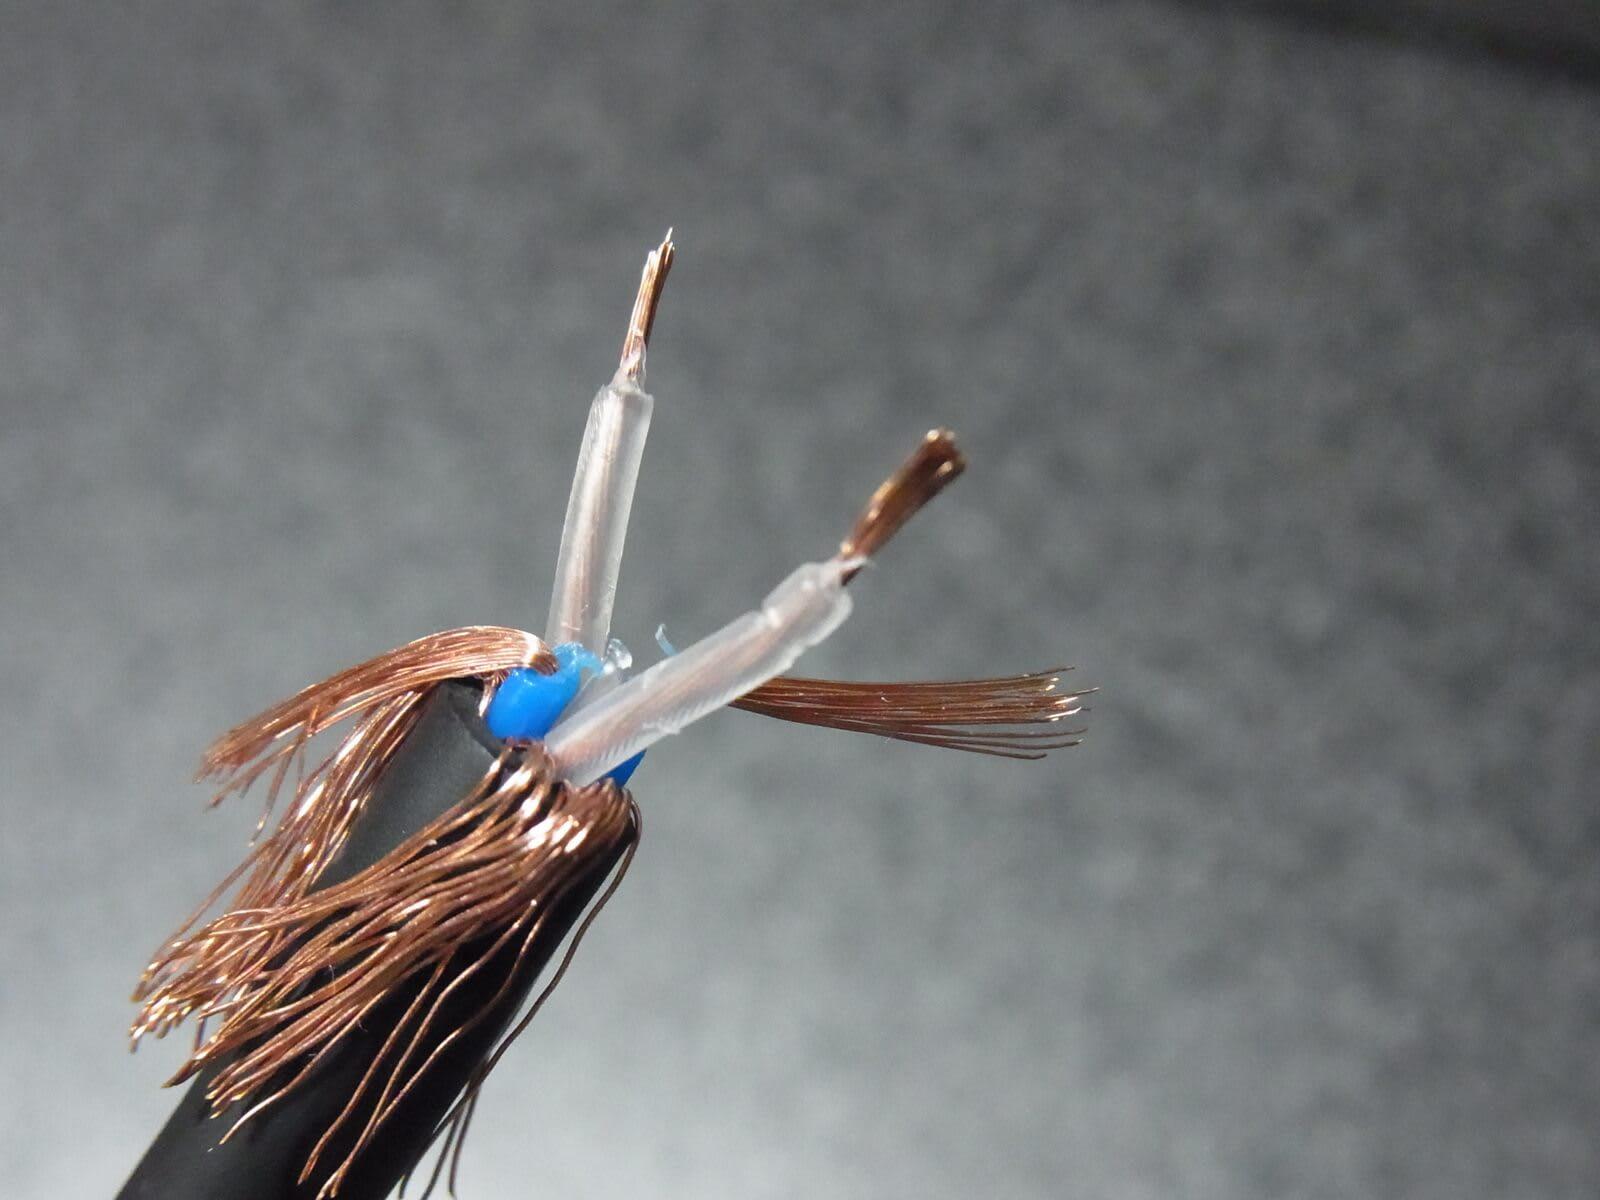 Mogami 2534 芯線